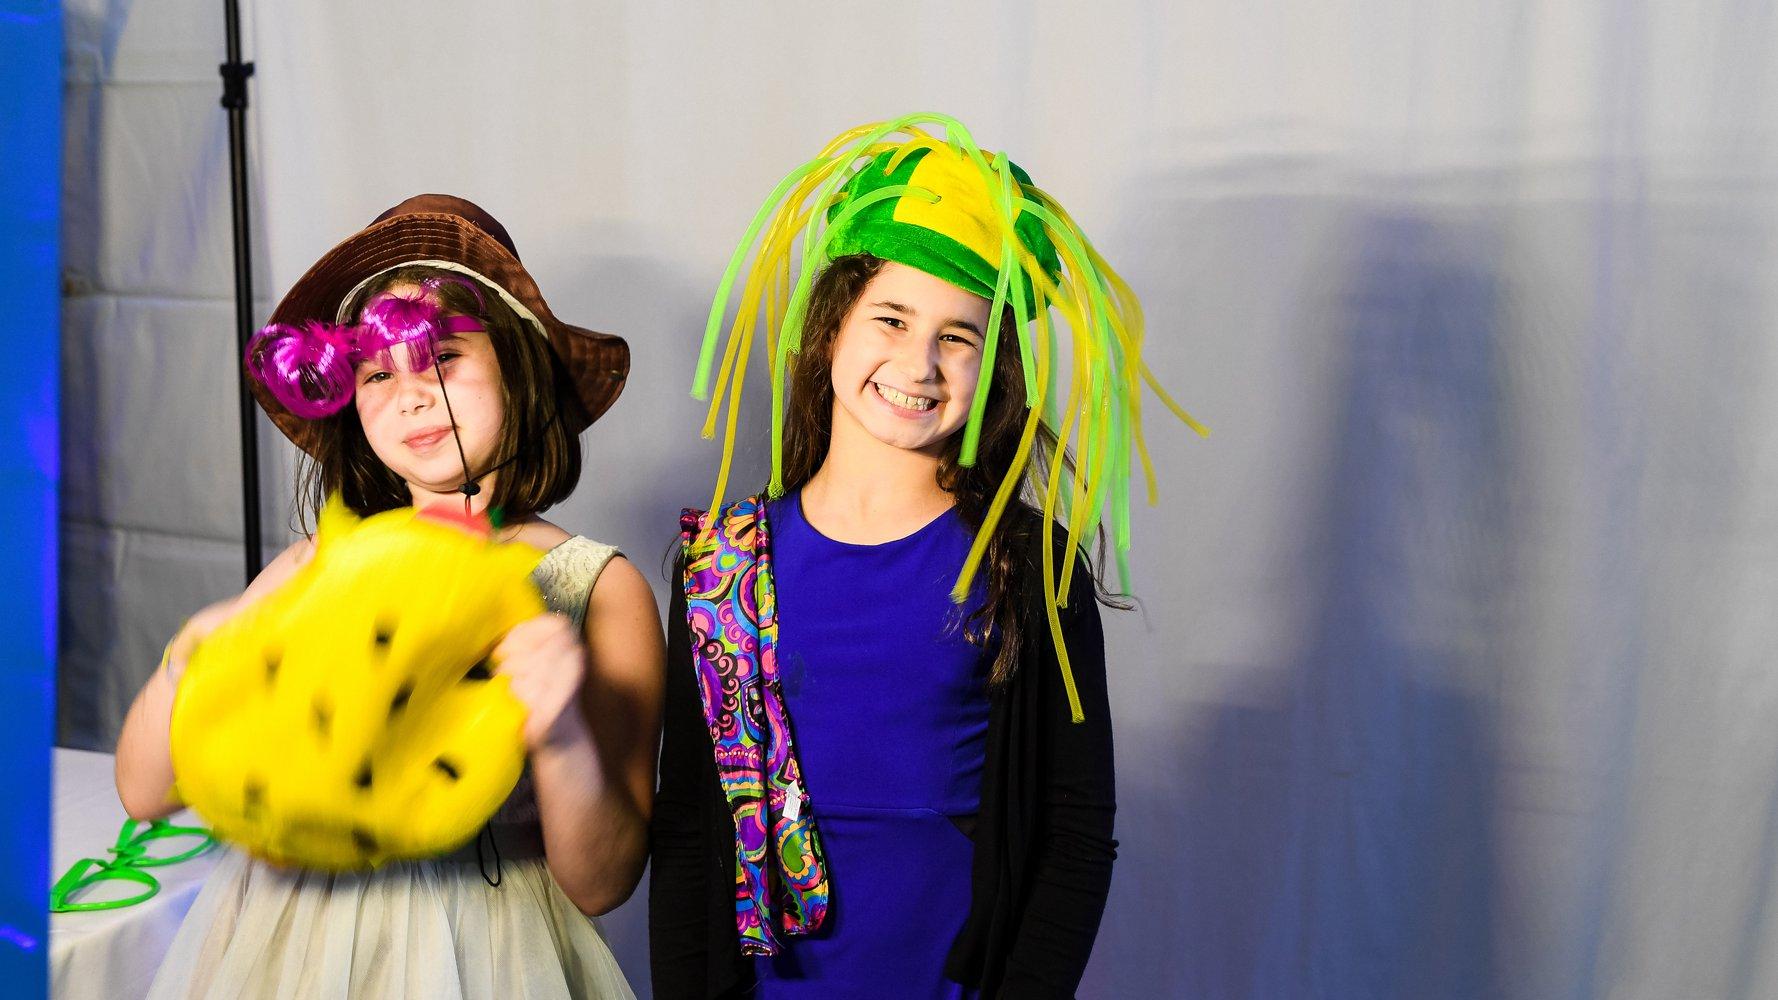 Bar Mitzvah kids posing for photo booth